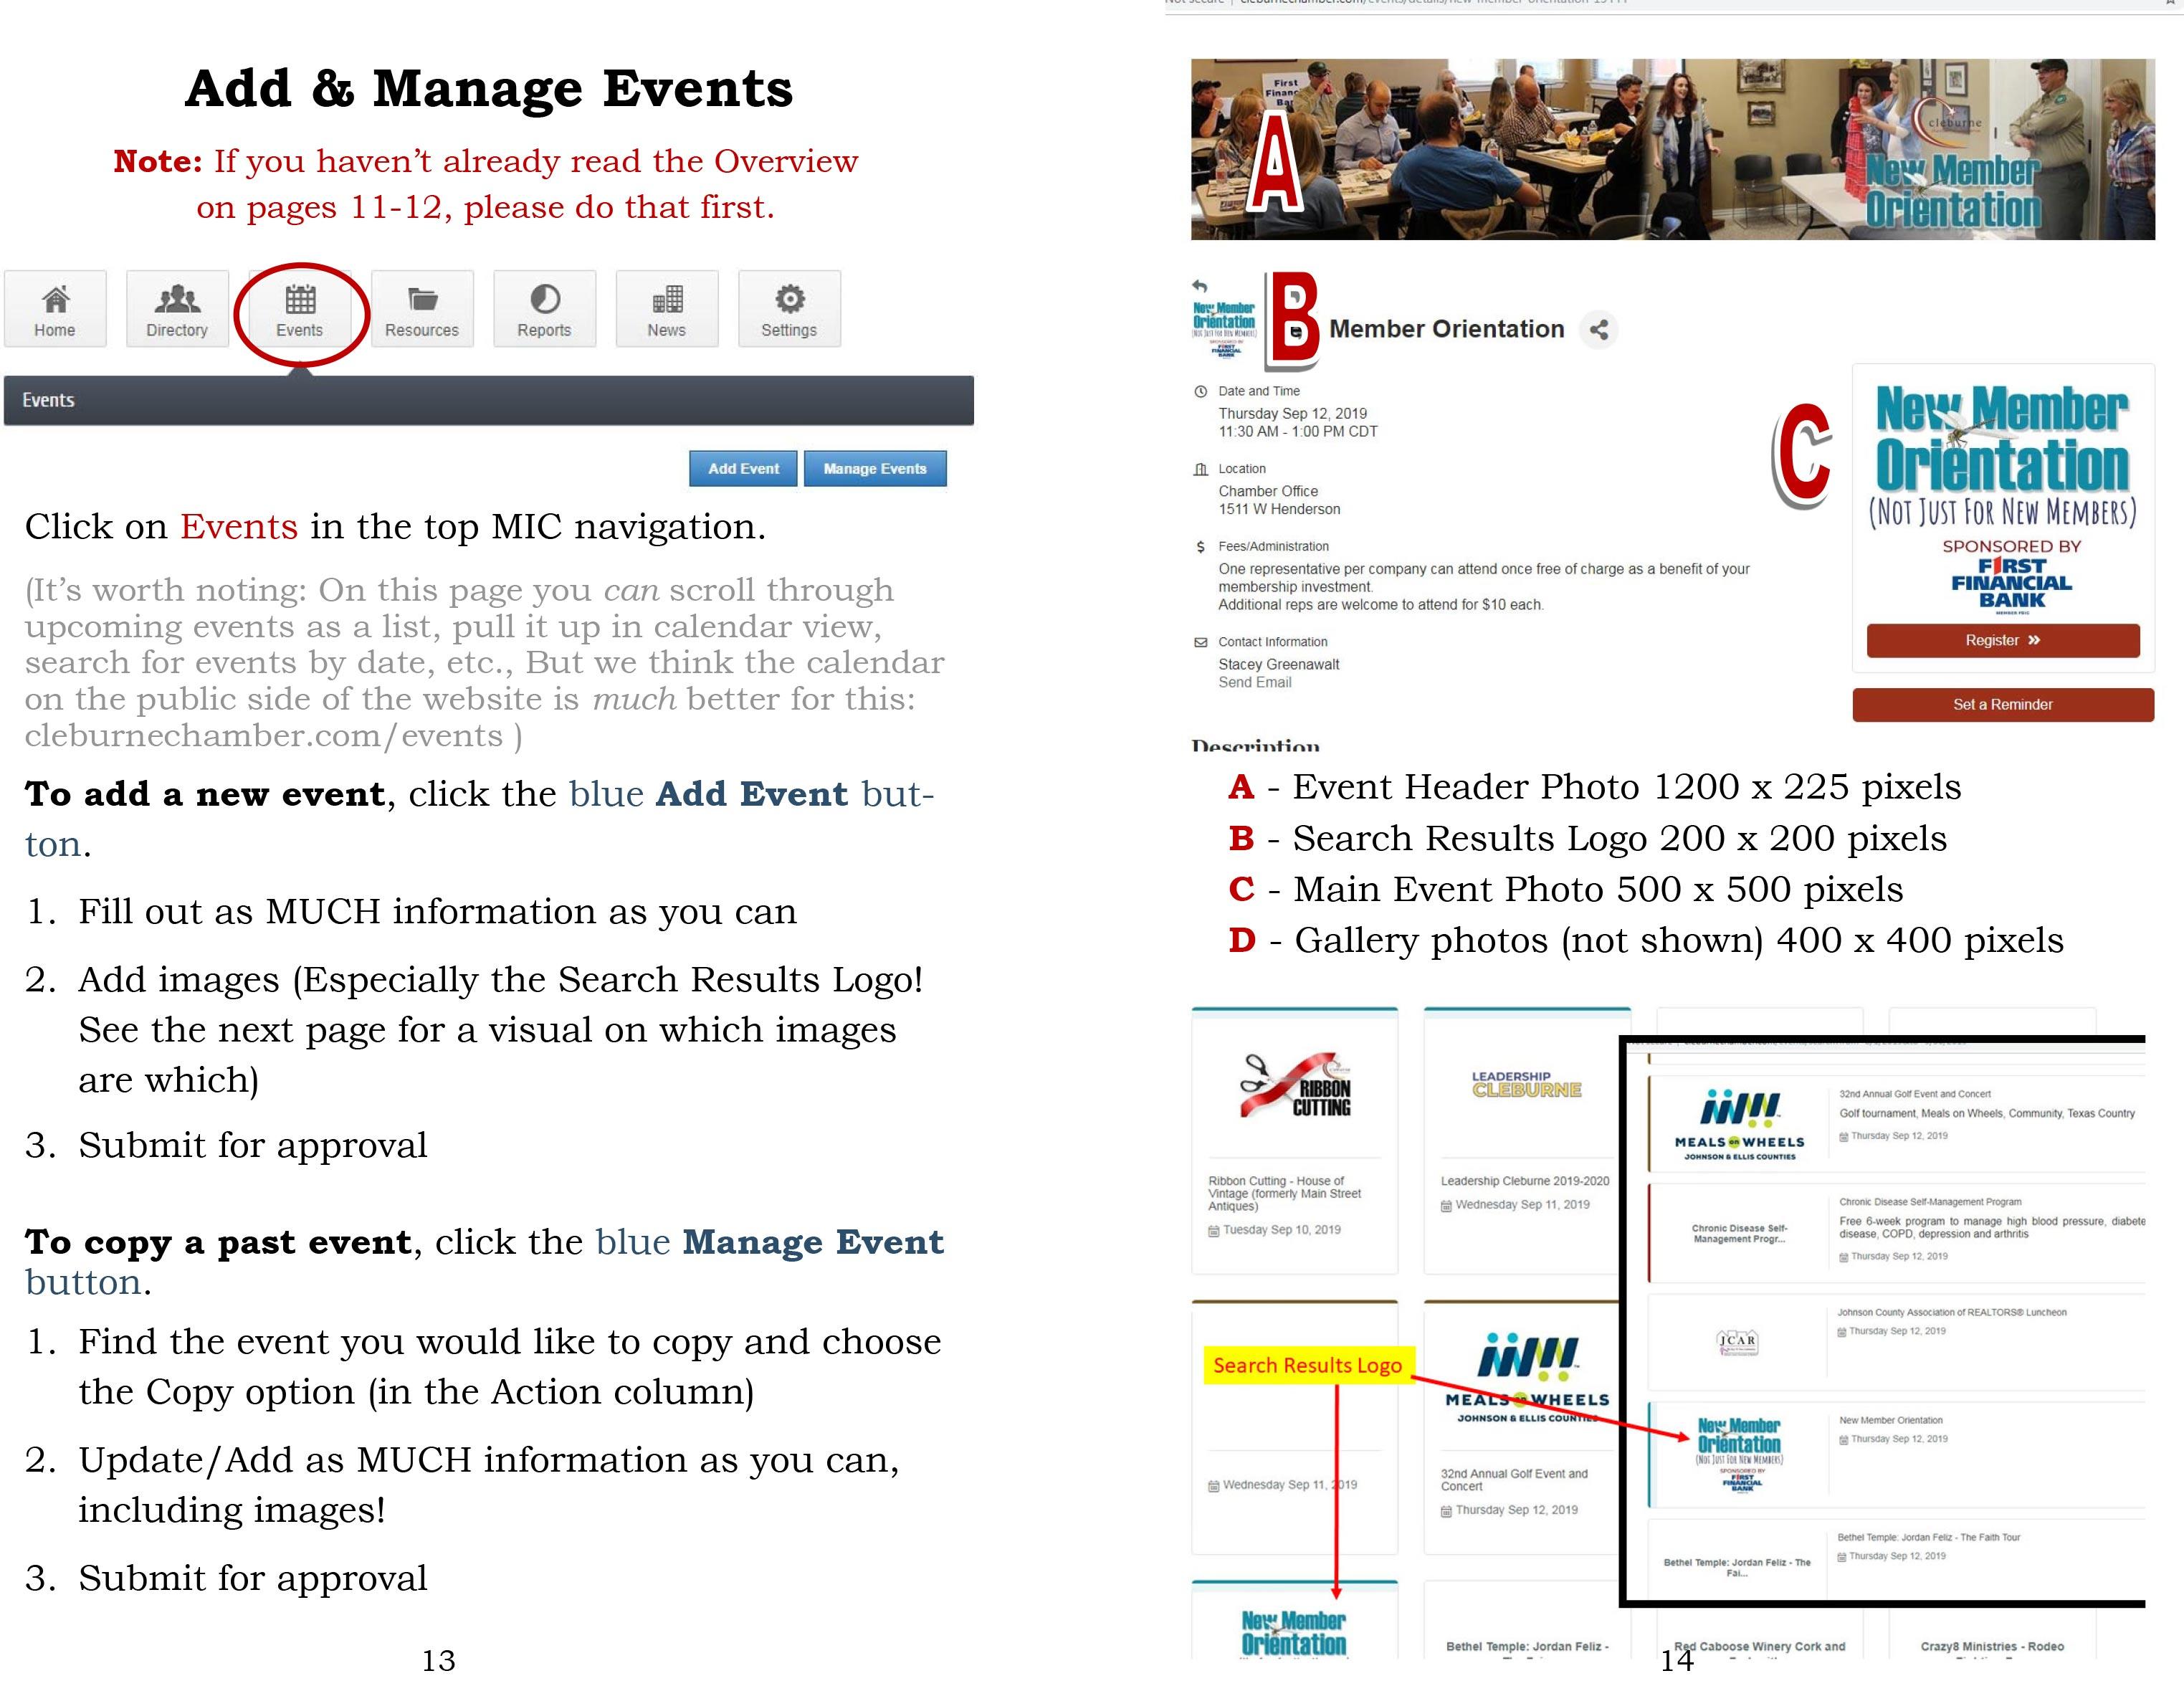 Adding Events